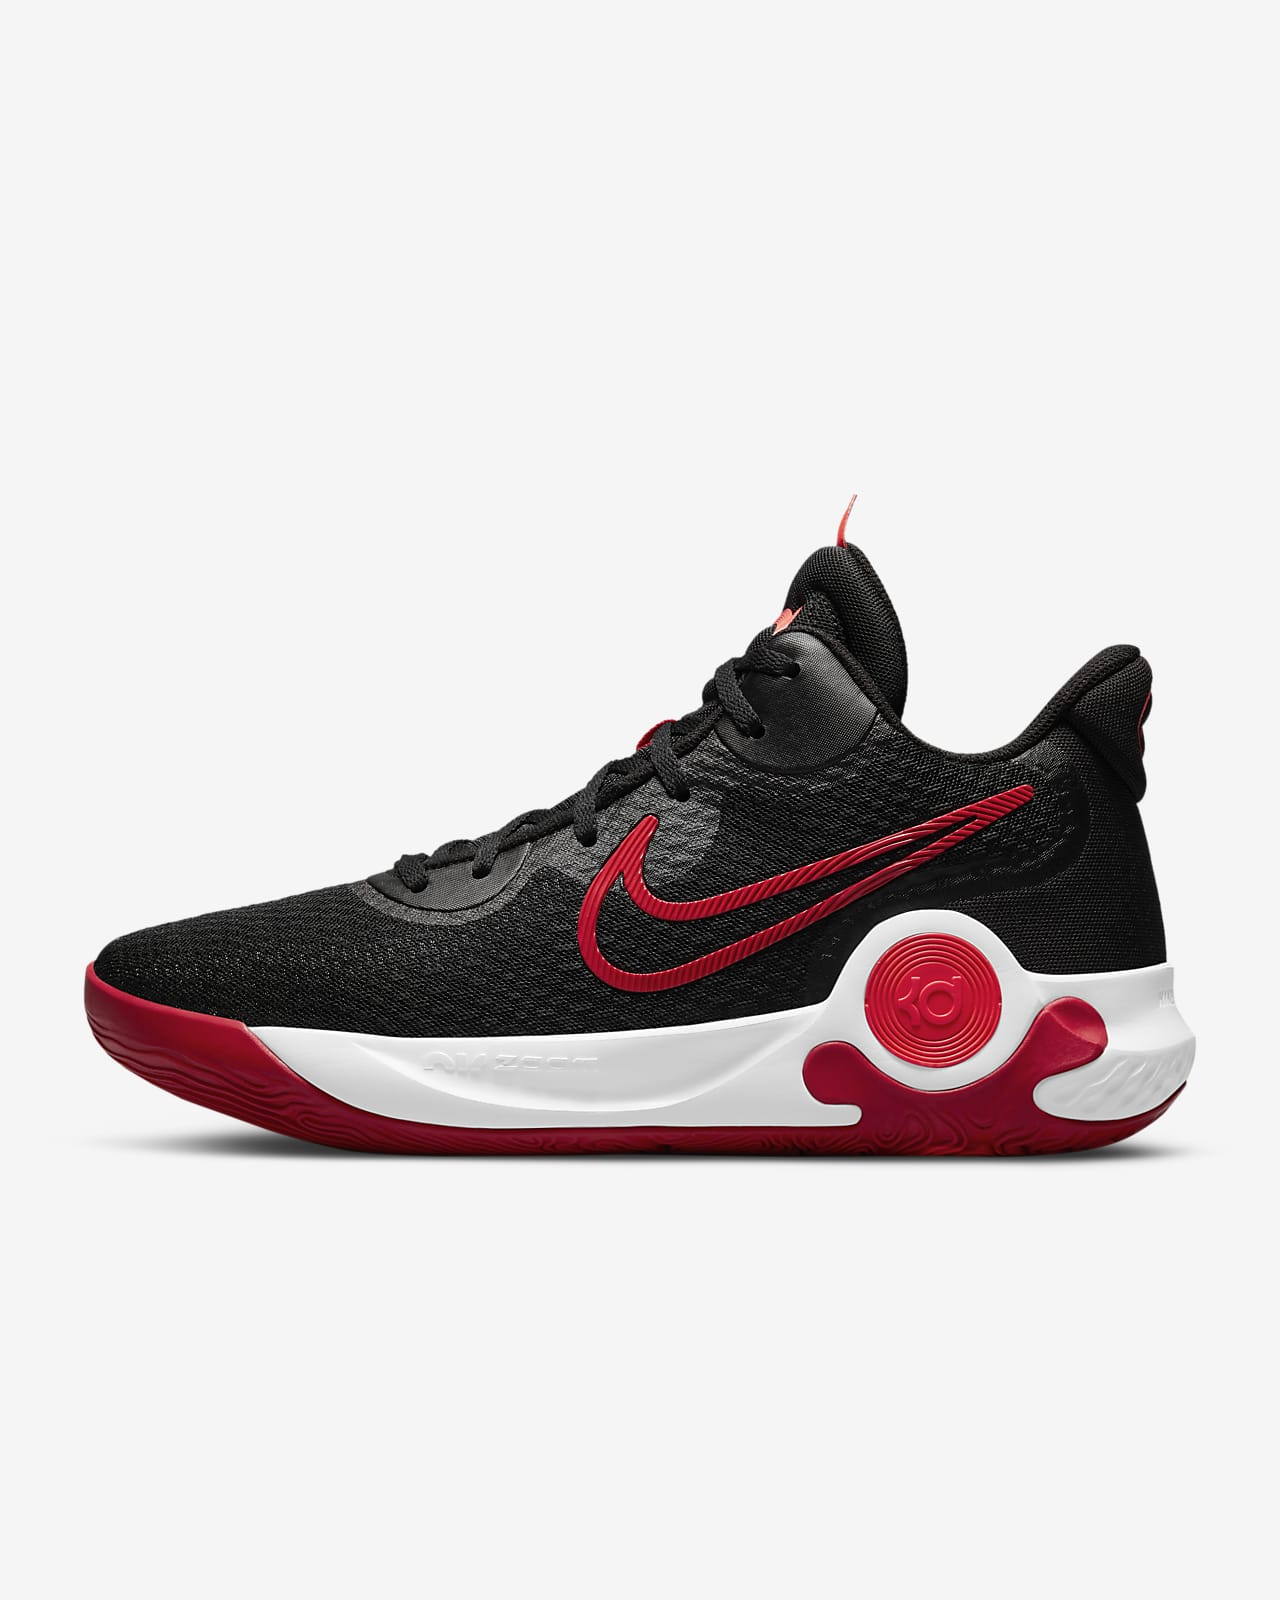 KD Trey 5 IX EP 籃球鞋